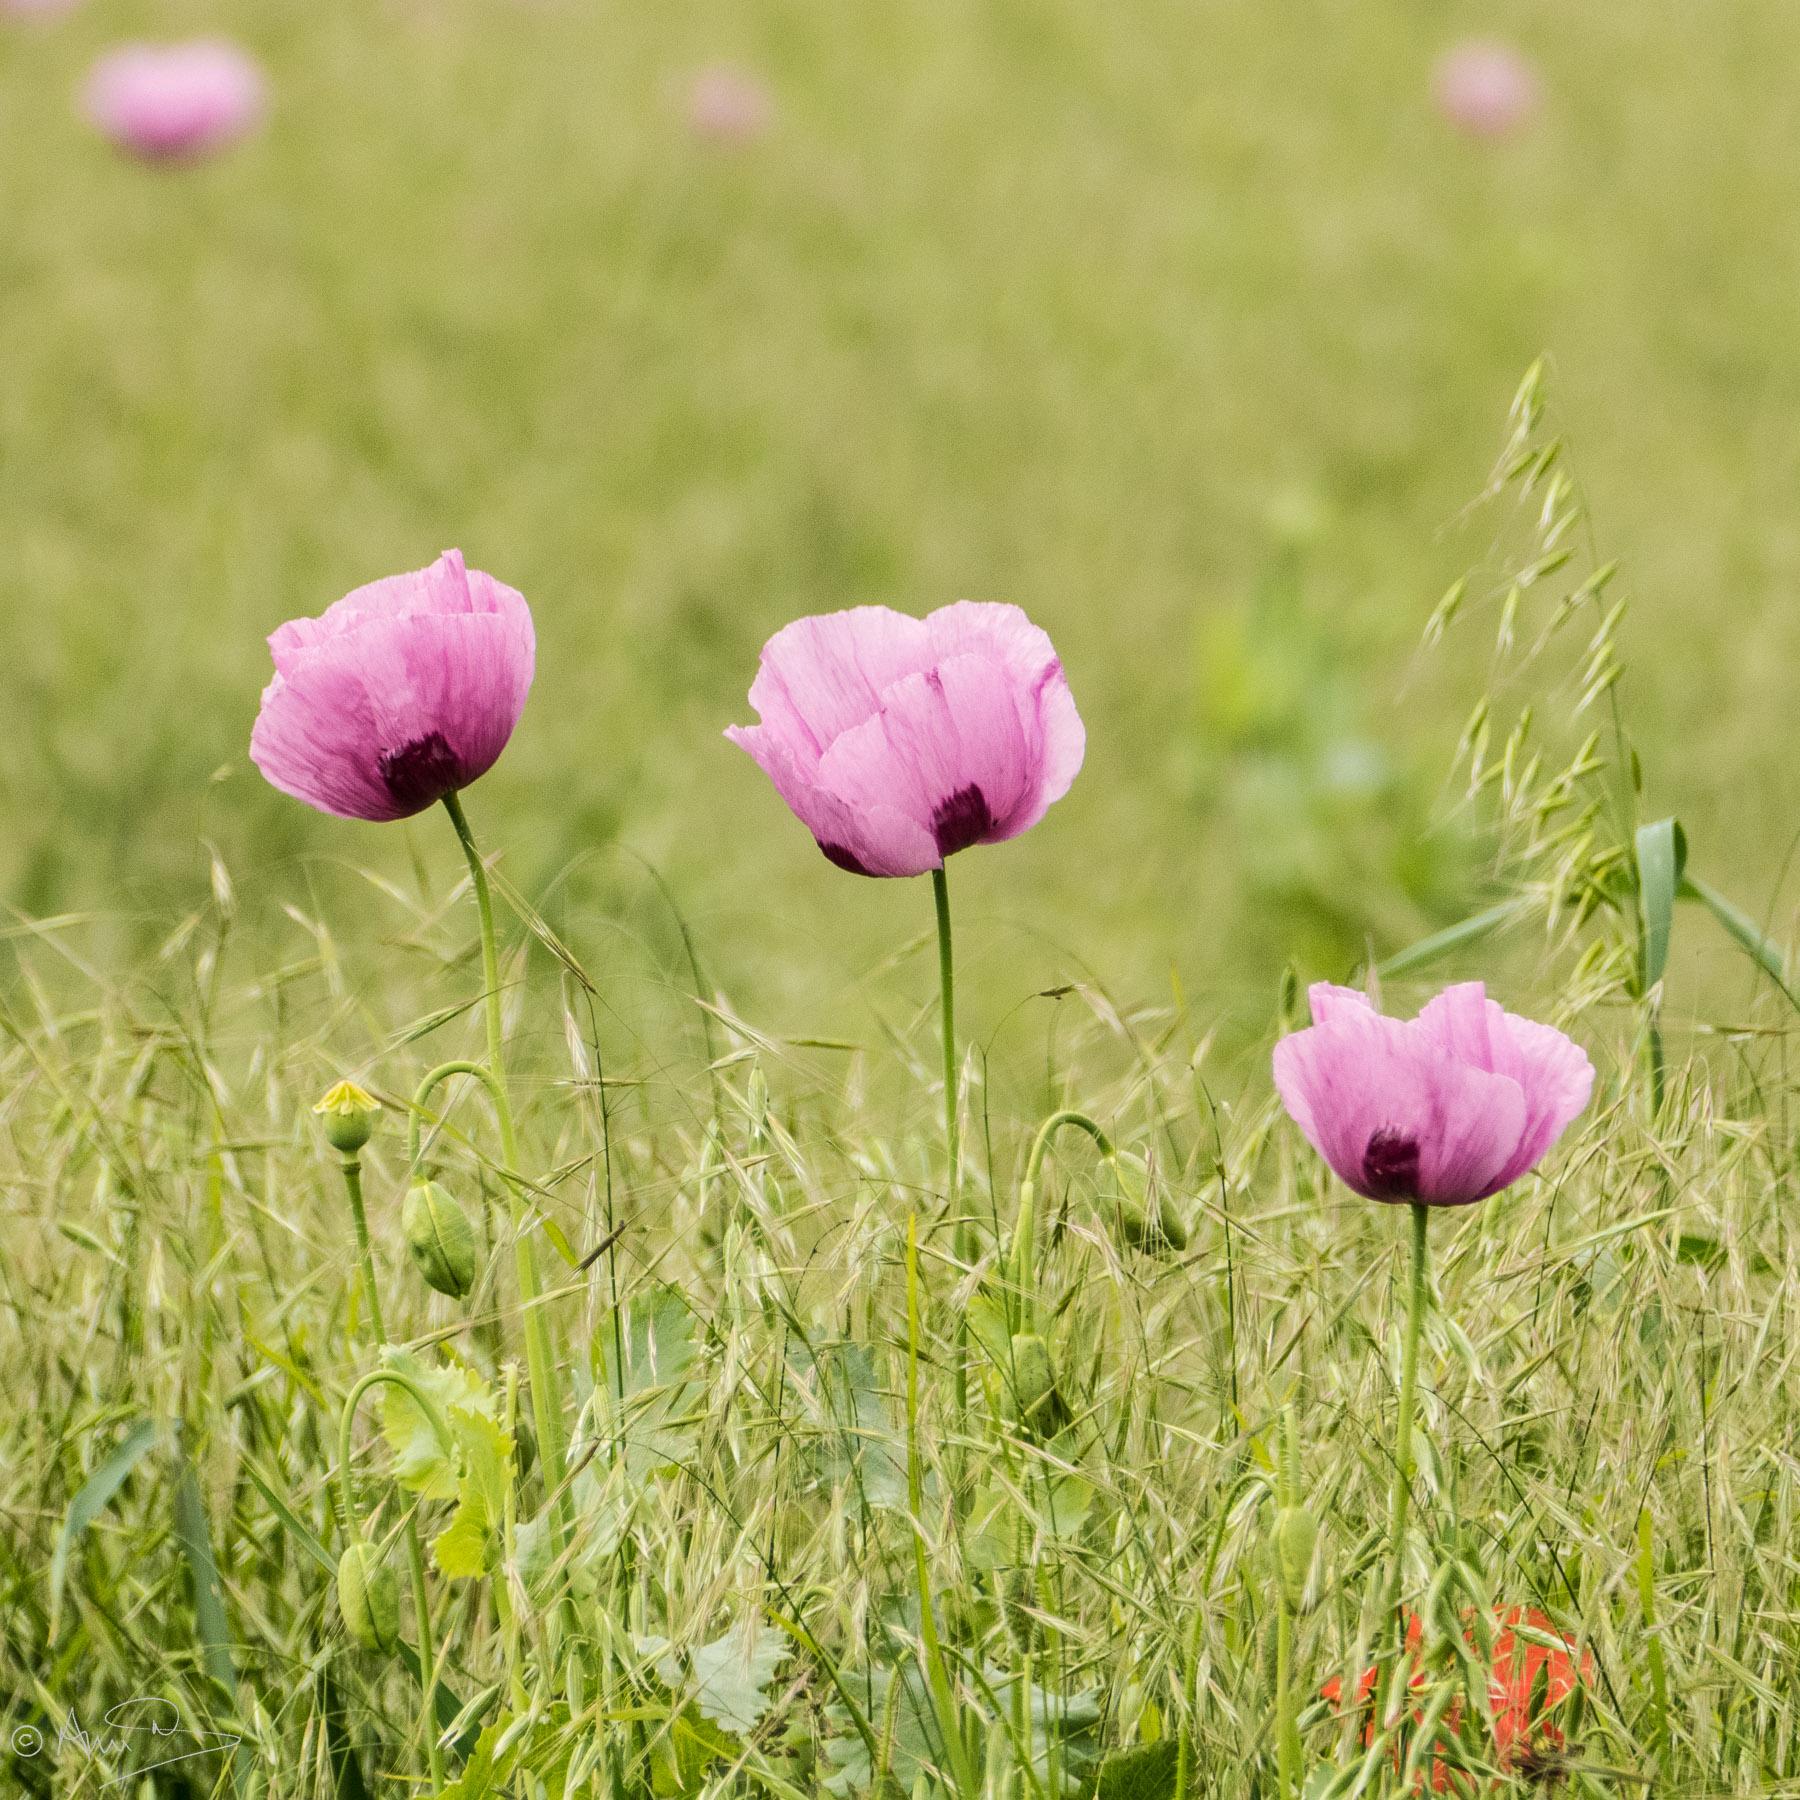 Wild opium poppies